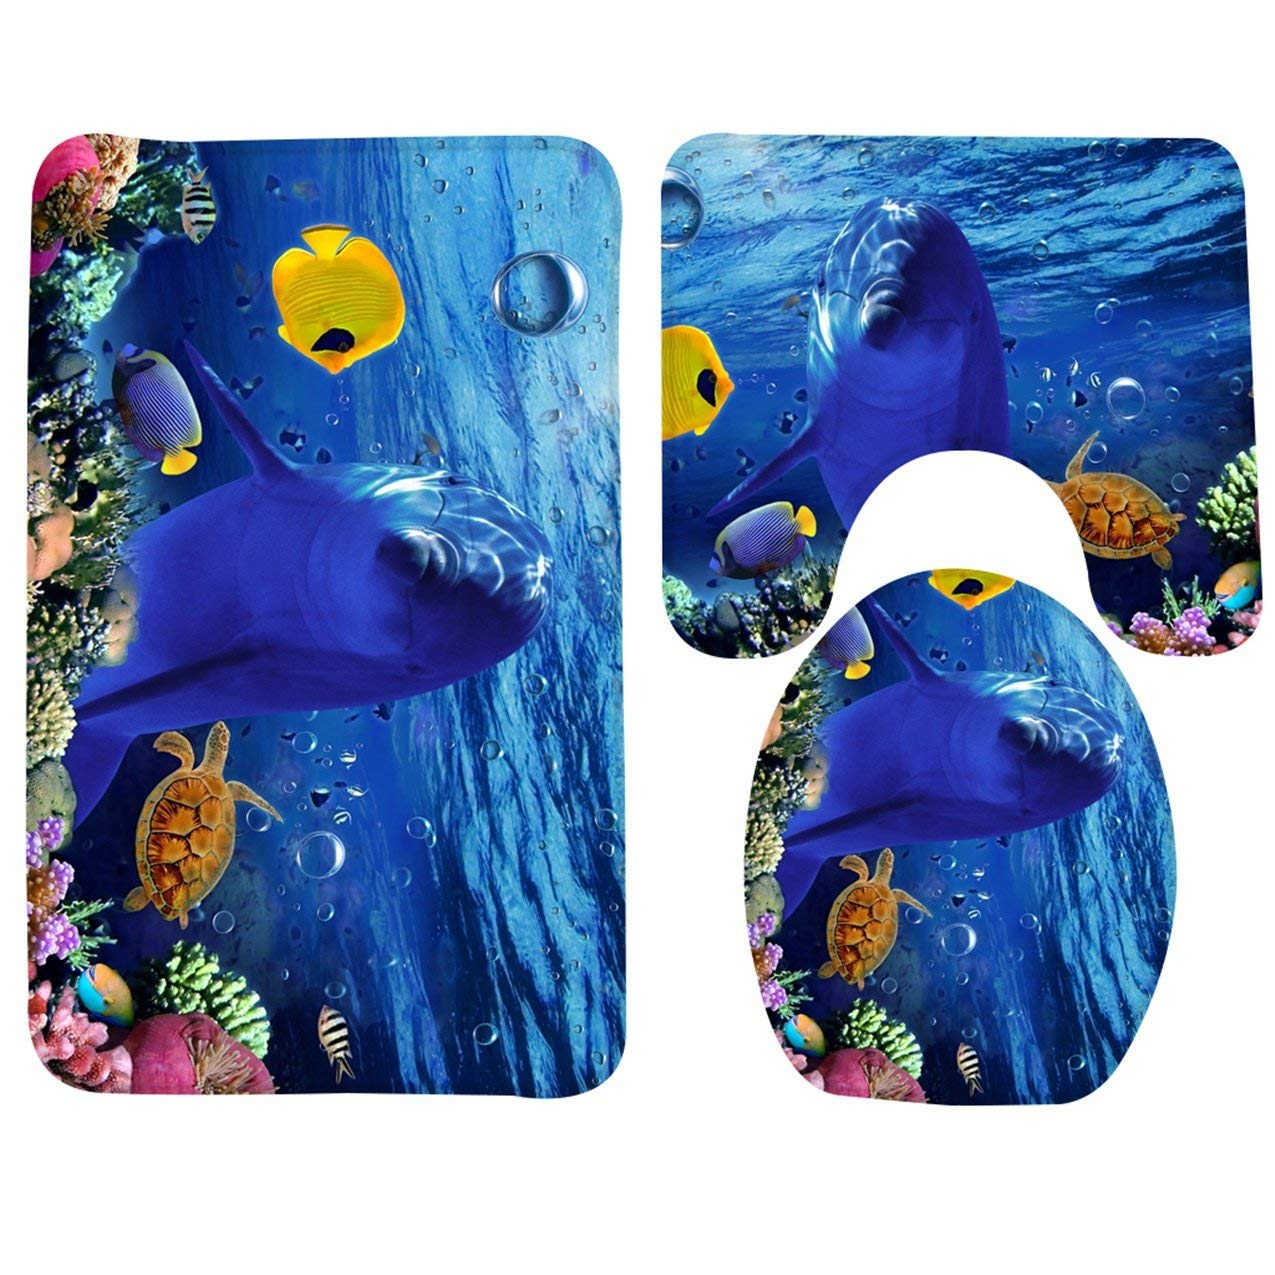 1 Set (3 Pcs/Set) Cartoon Dolphin Underwater Soft Foam Shower Bathroom Mat Toddler Nonslip Textured Round Rubber Suction Stick Cups Absorbent Superb Popular Vintage Hotel Washable Bathmats Toilet